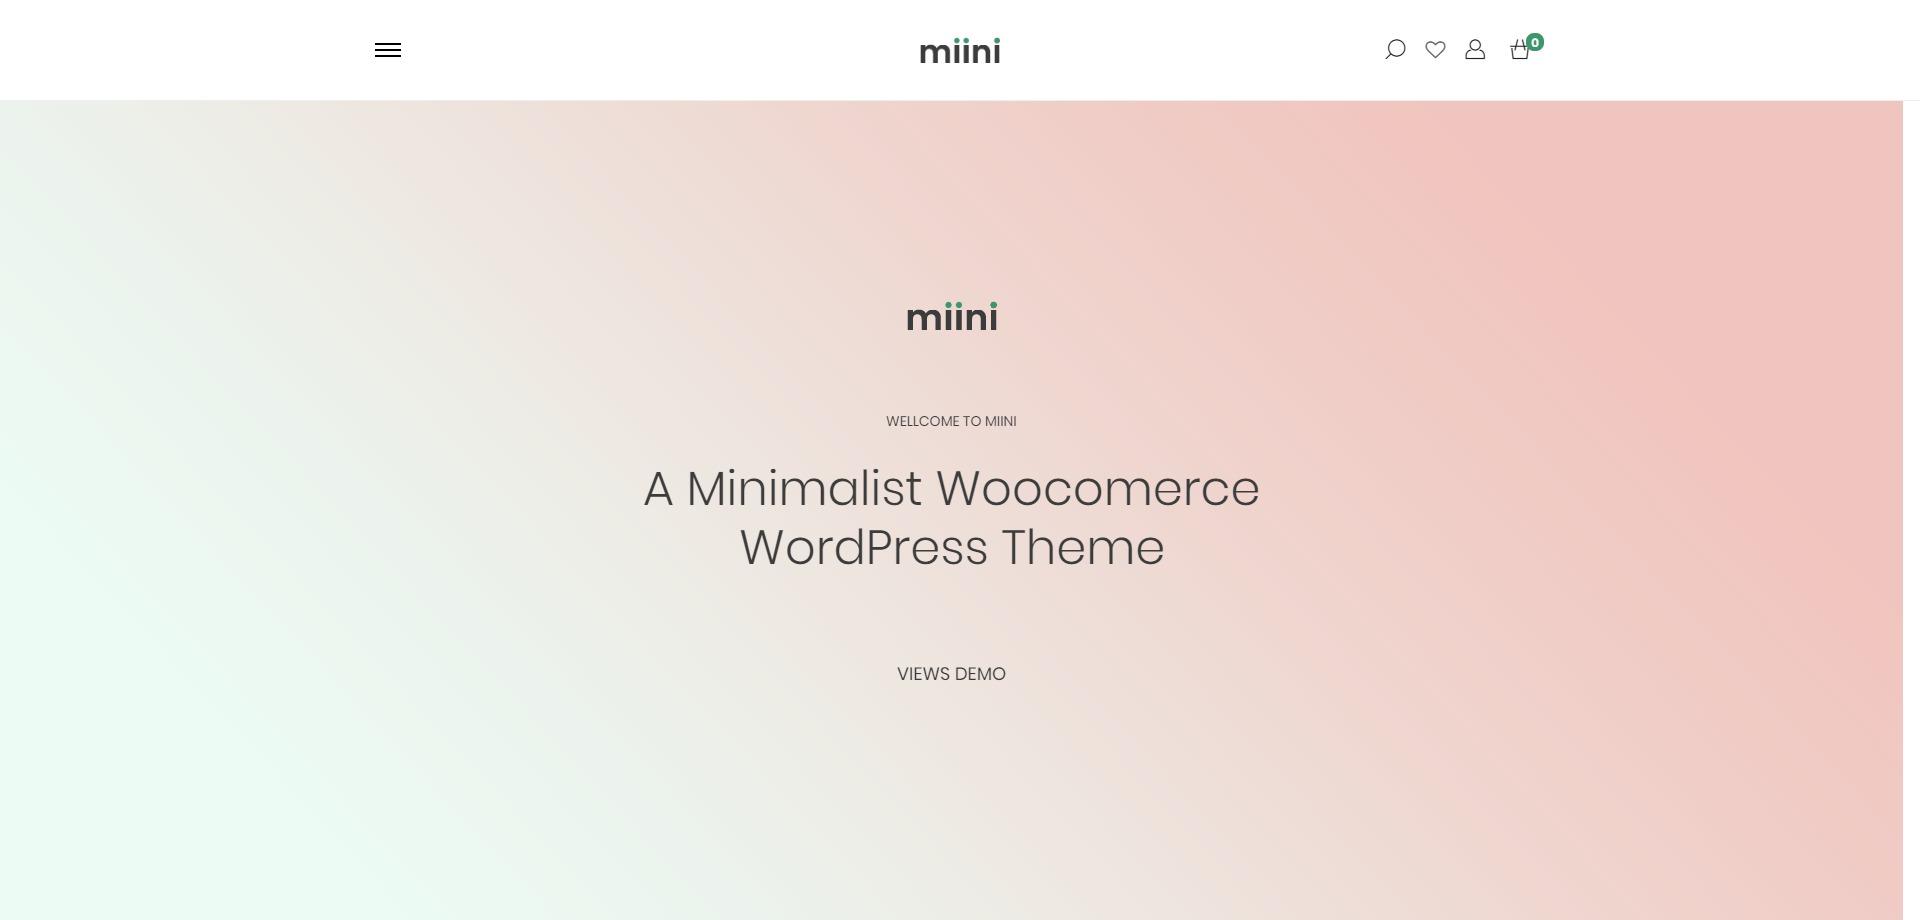 Miini-简约极速电子商务商城WordPress主题